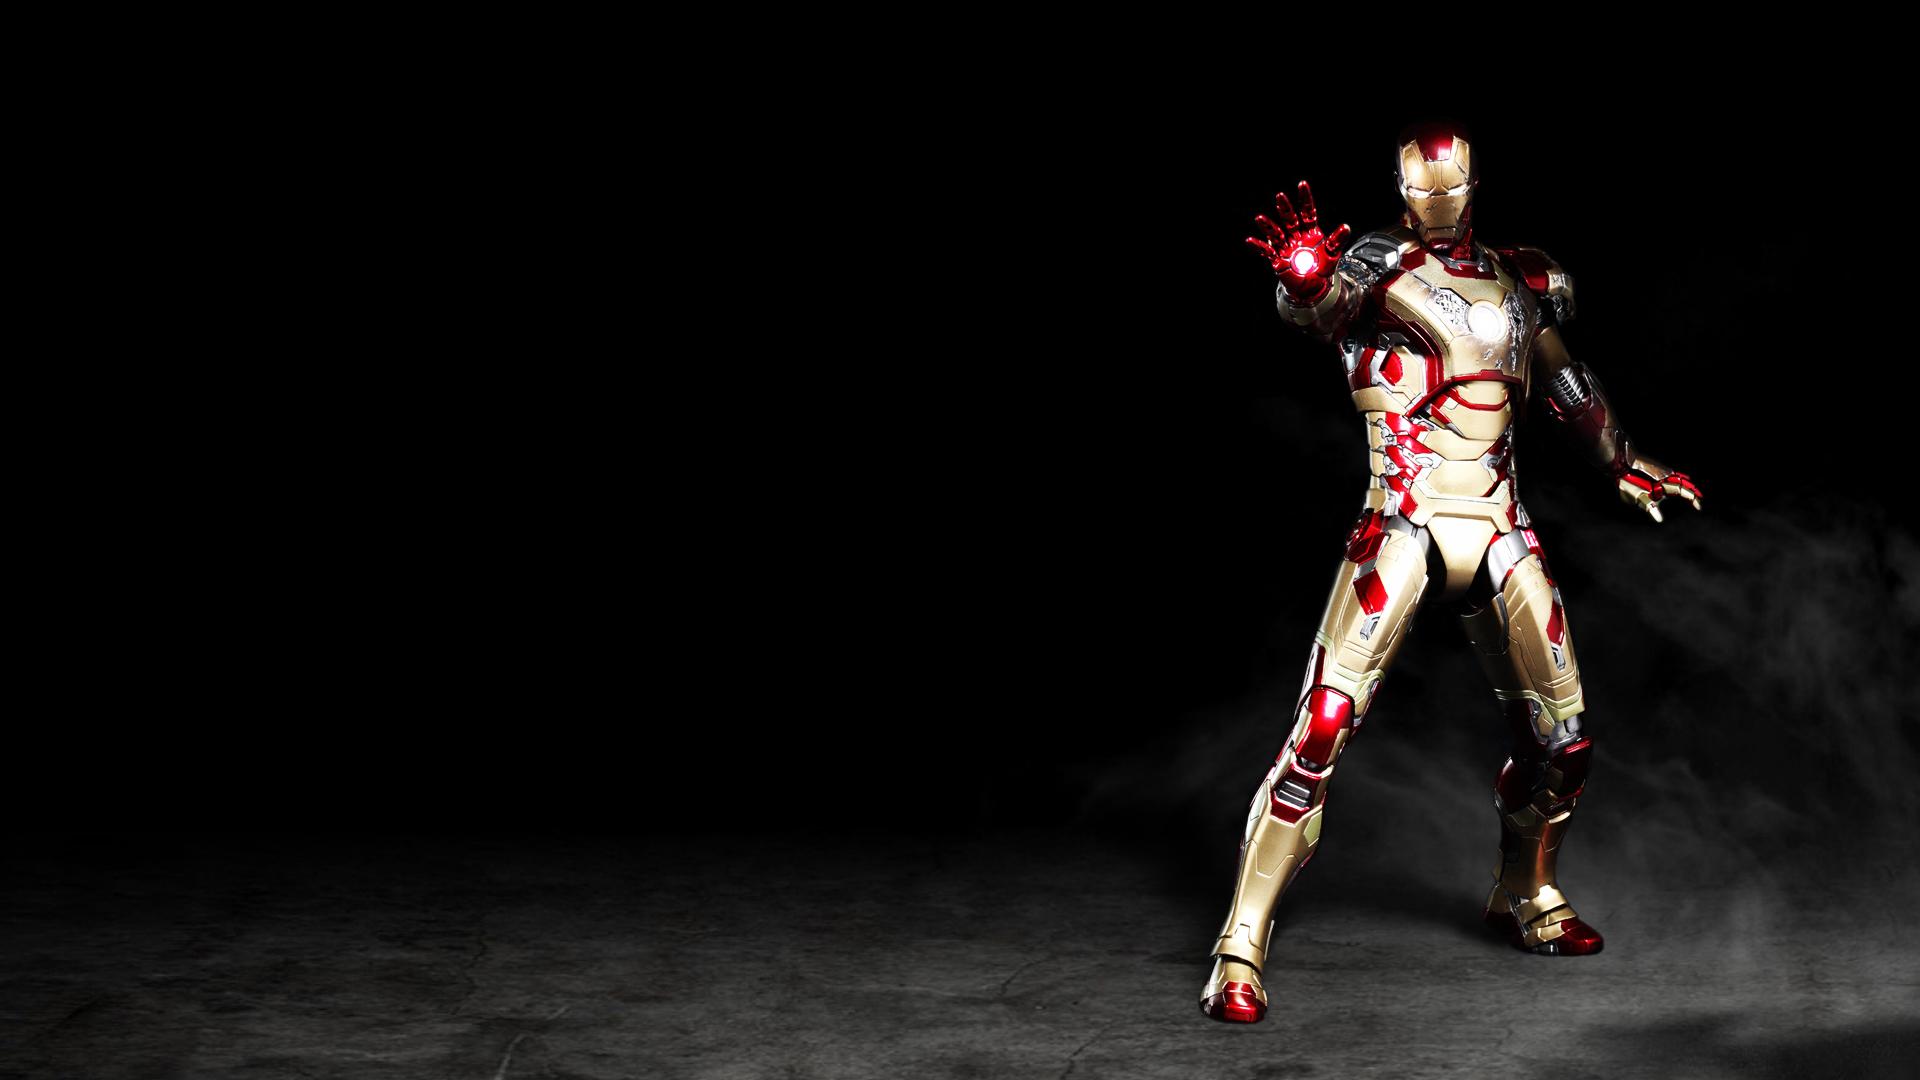 Iron Man Wallpaper Hd 8969 1920x1080px